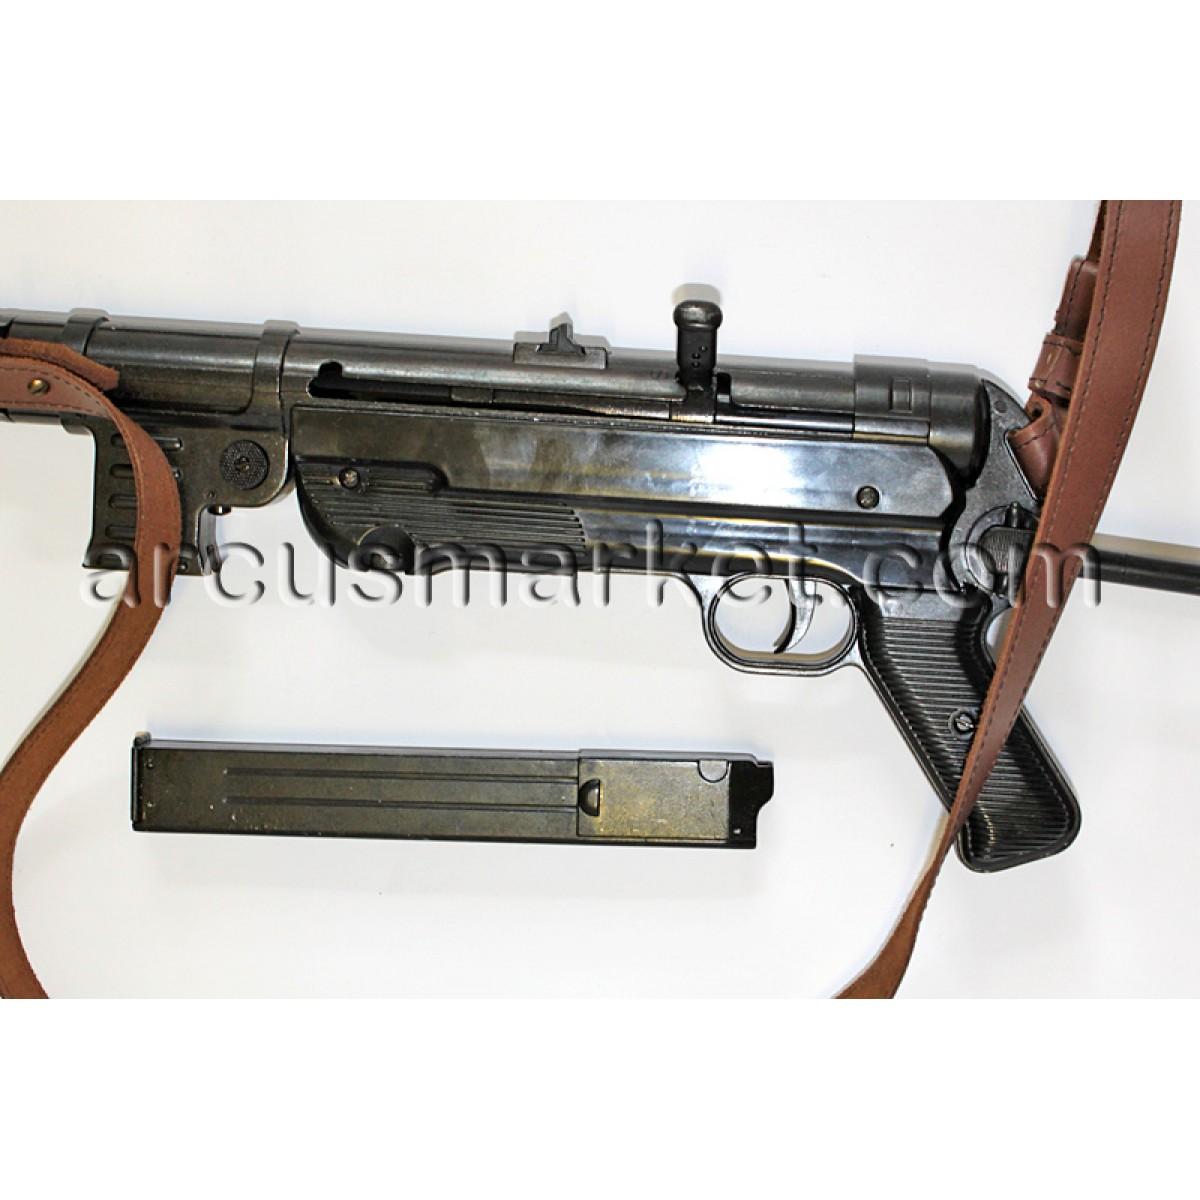 Пистолет-пулемет МР-40 (ремень), ММГ копия